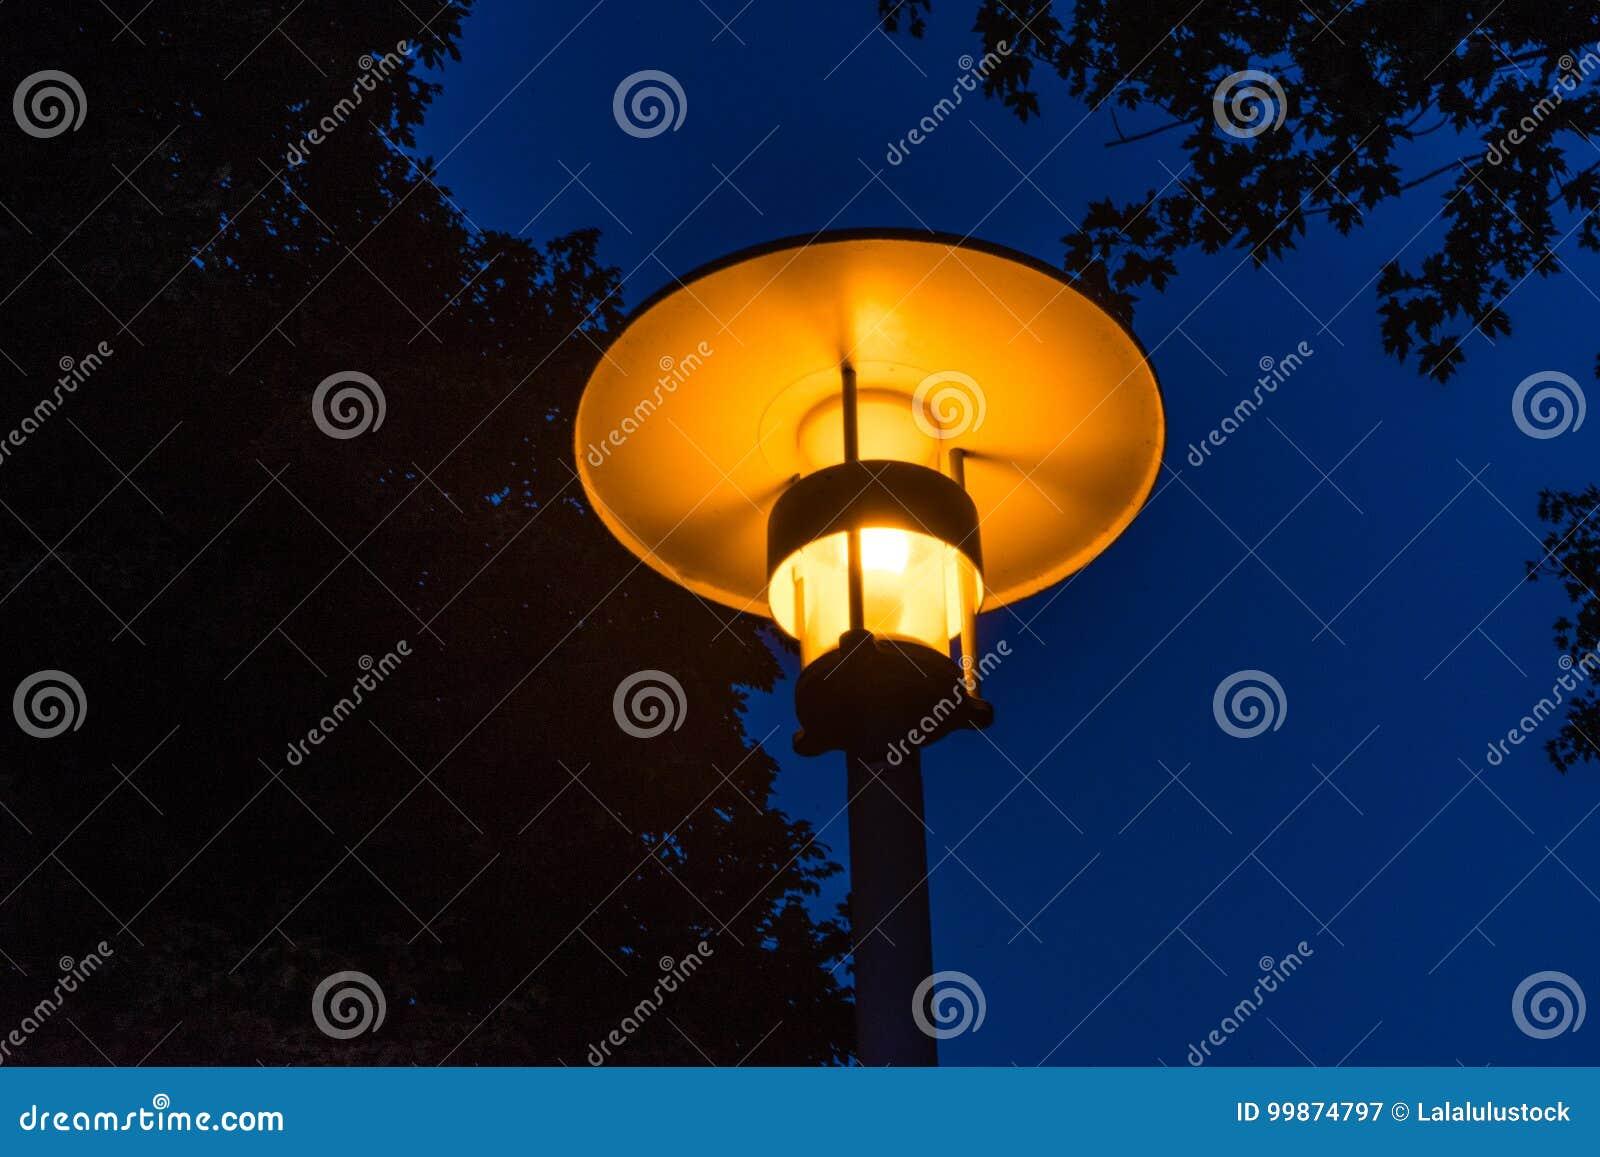 Street light night view orange light with tree